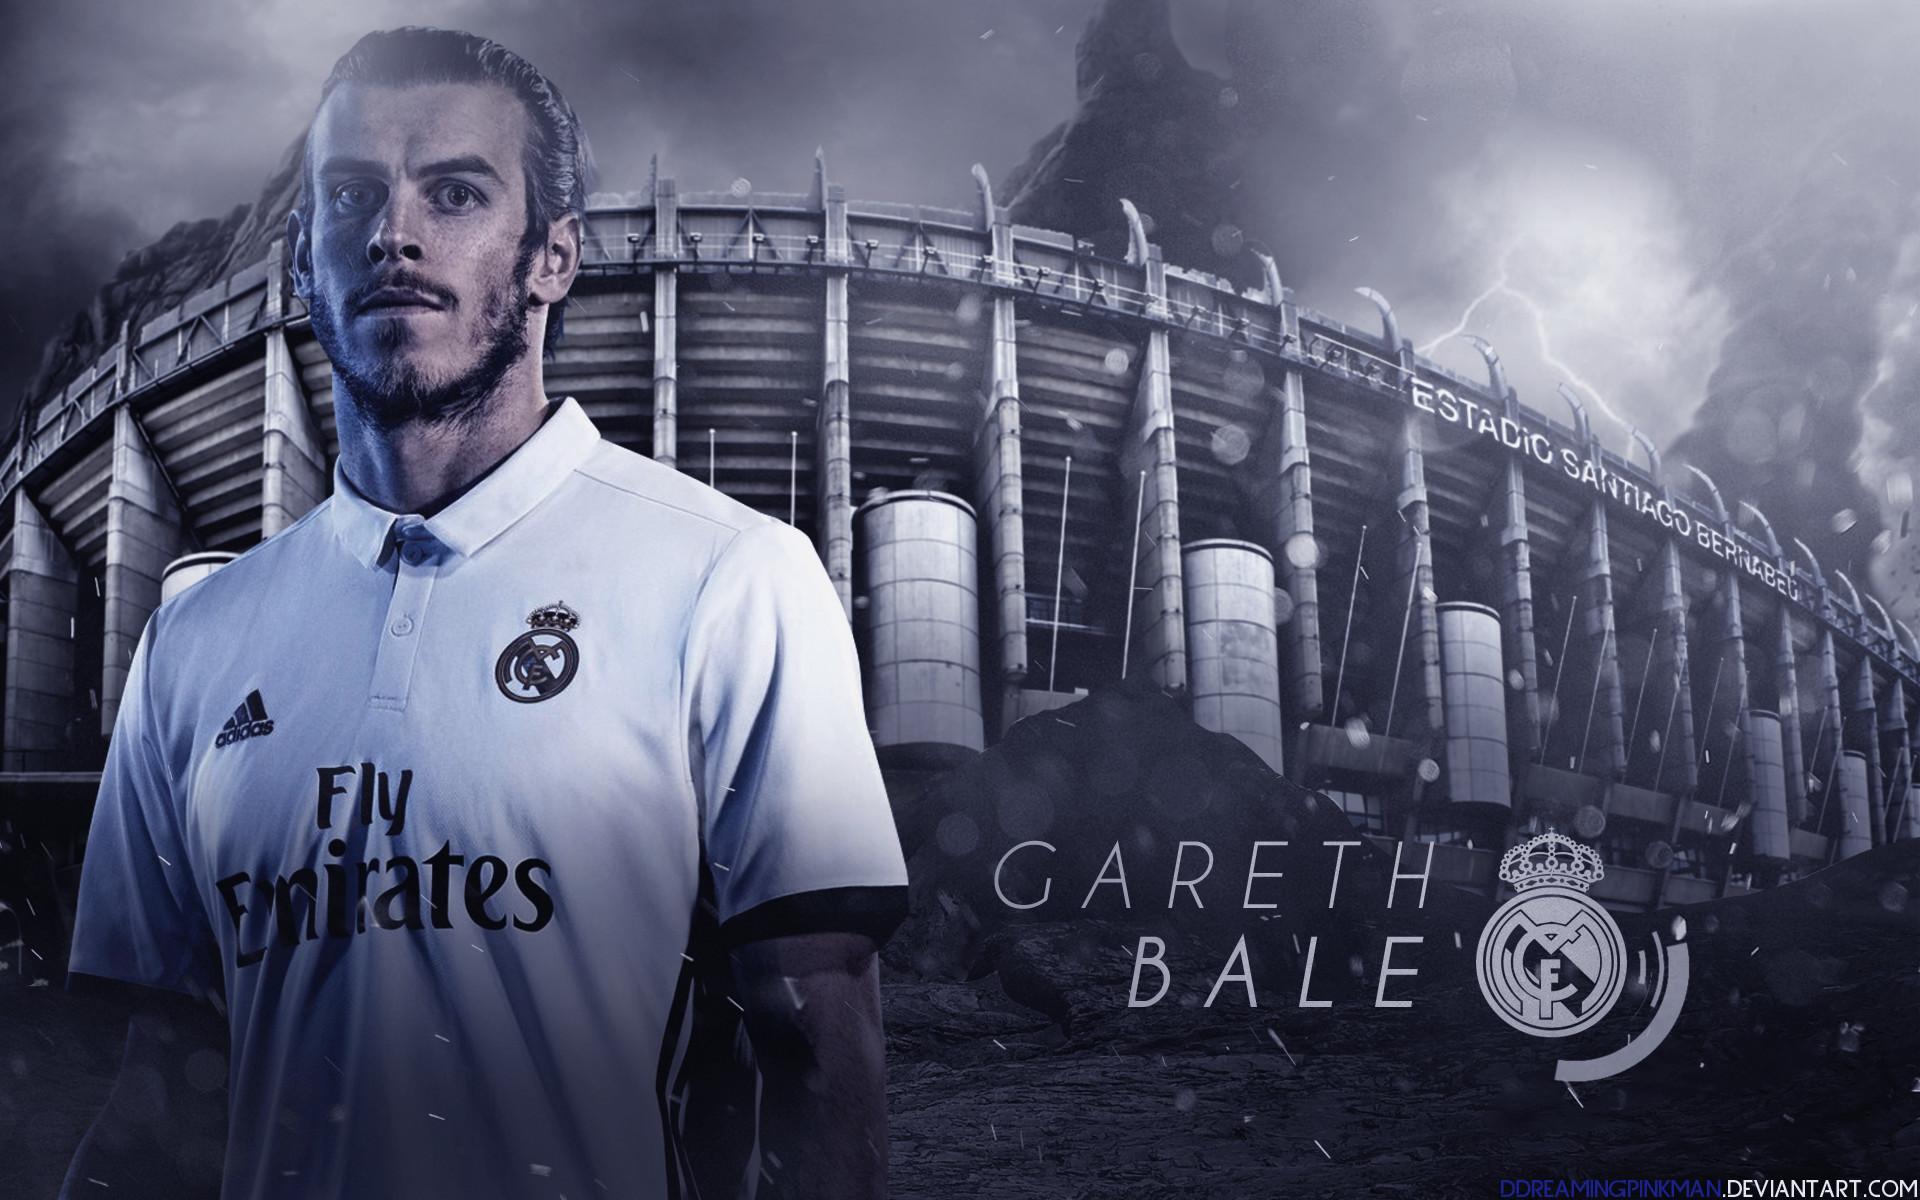 Gareth Bale Wallpaper (68+ Images